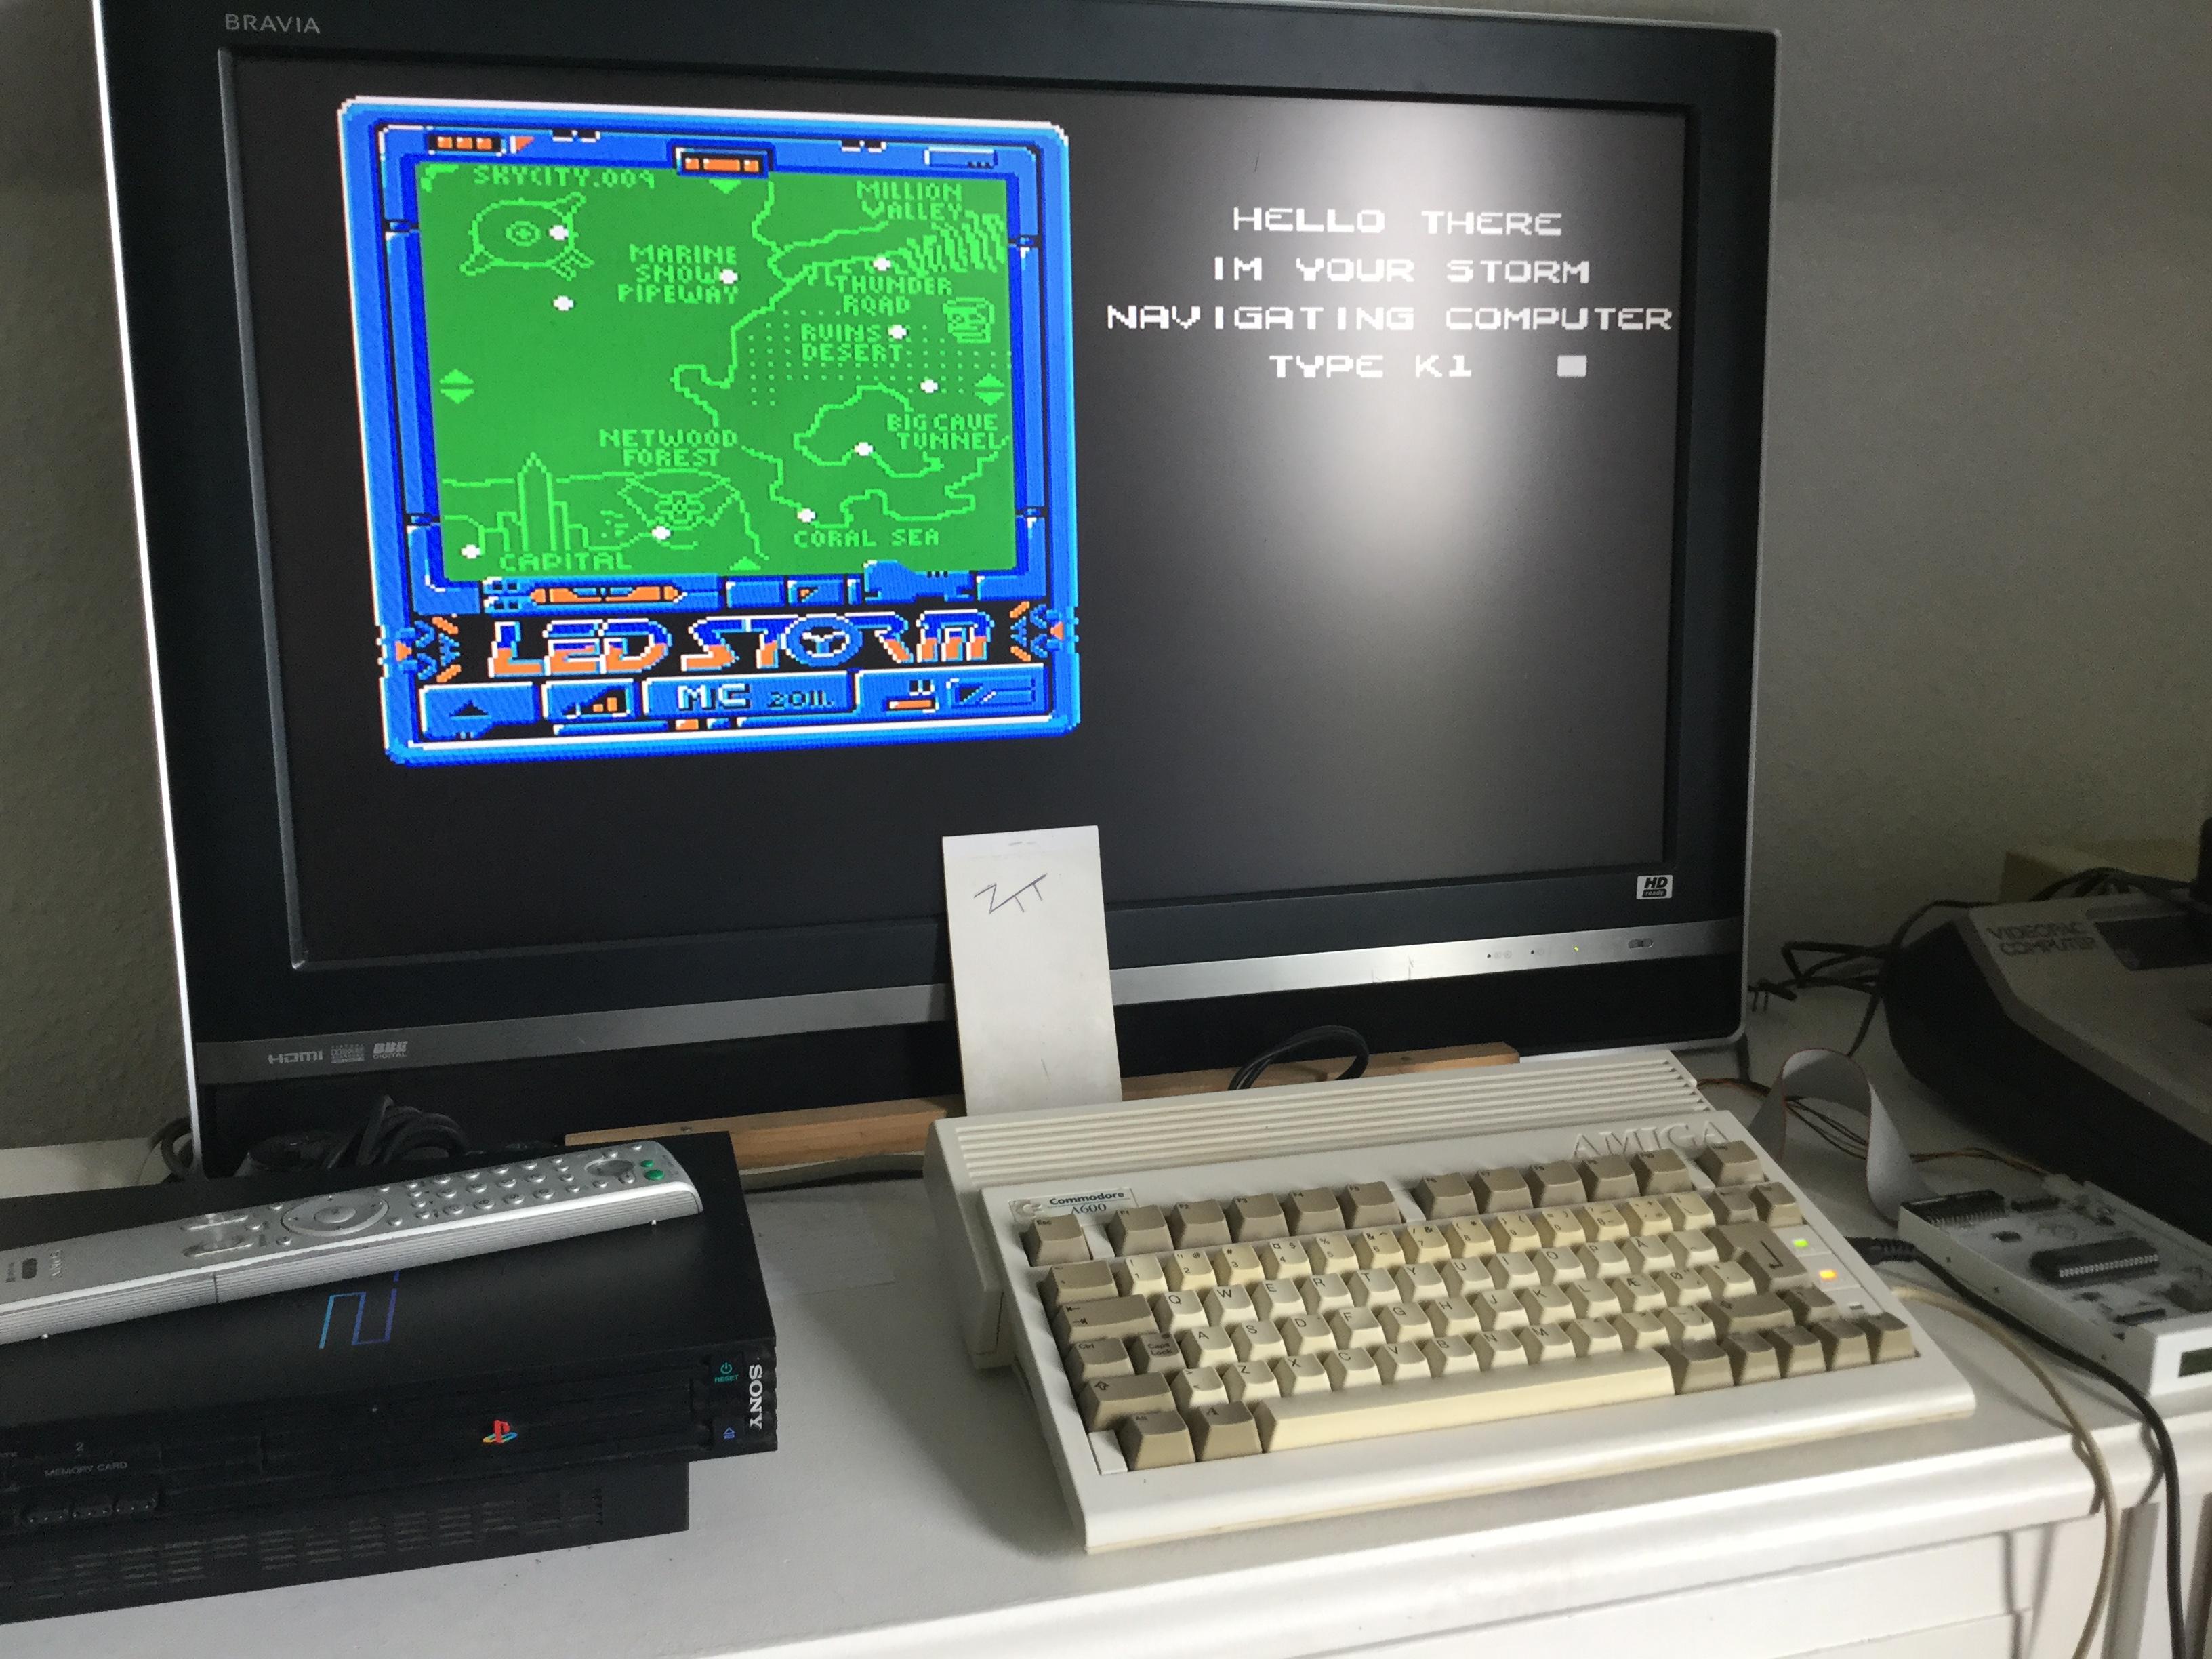 Frankie: LED Storm - Lazer Enhanced Destruction (Amiga) 97,270 points on 2017-10-15 07:19:02